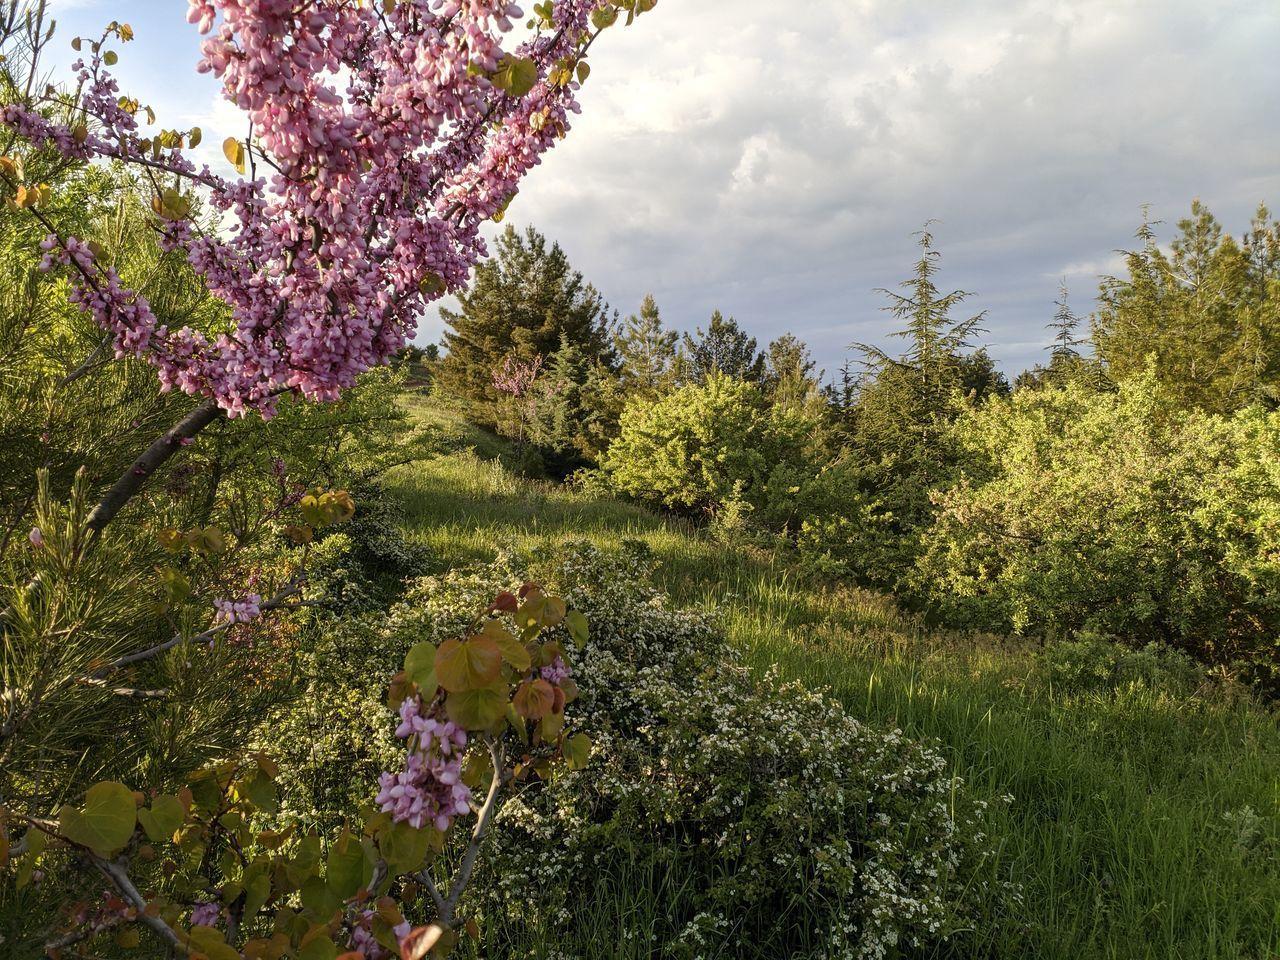 PINK FLOWERING PLANT AGAINST TREES